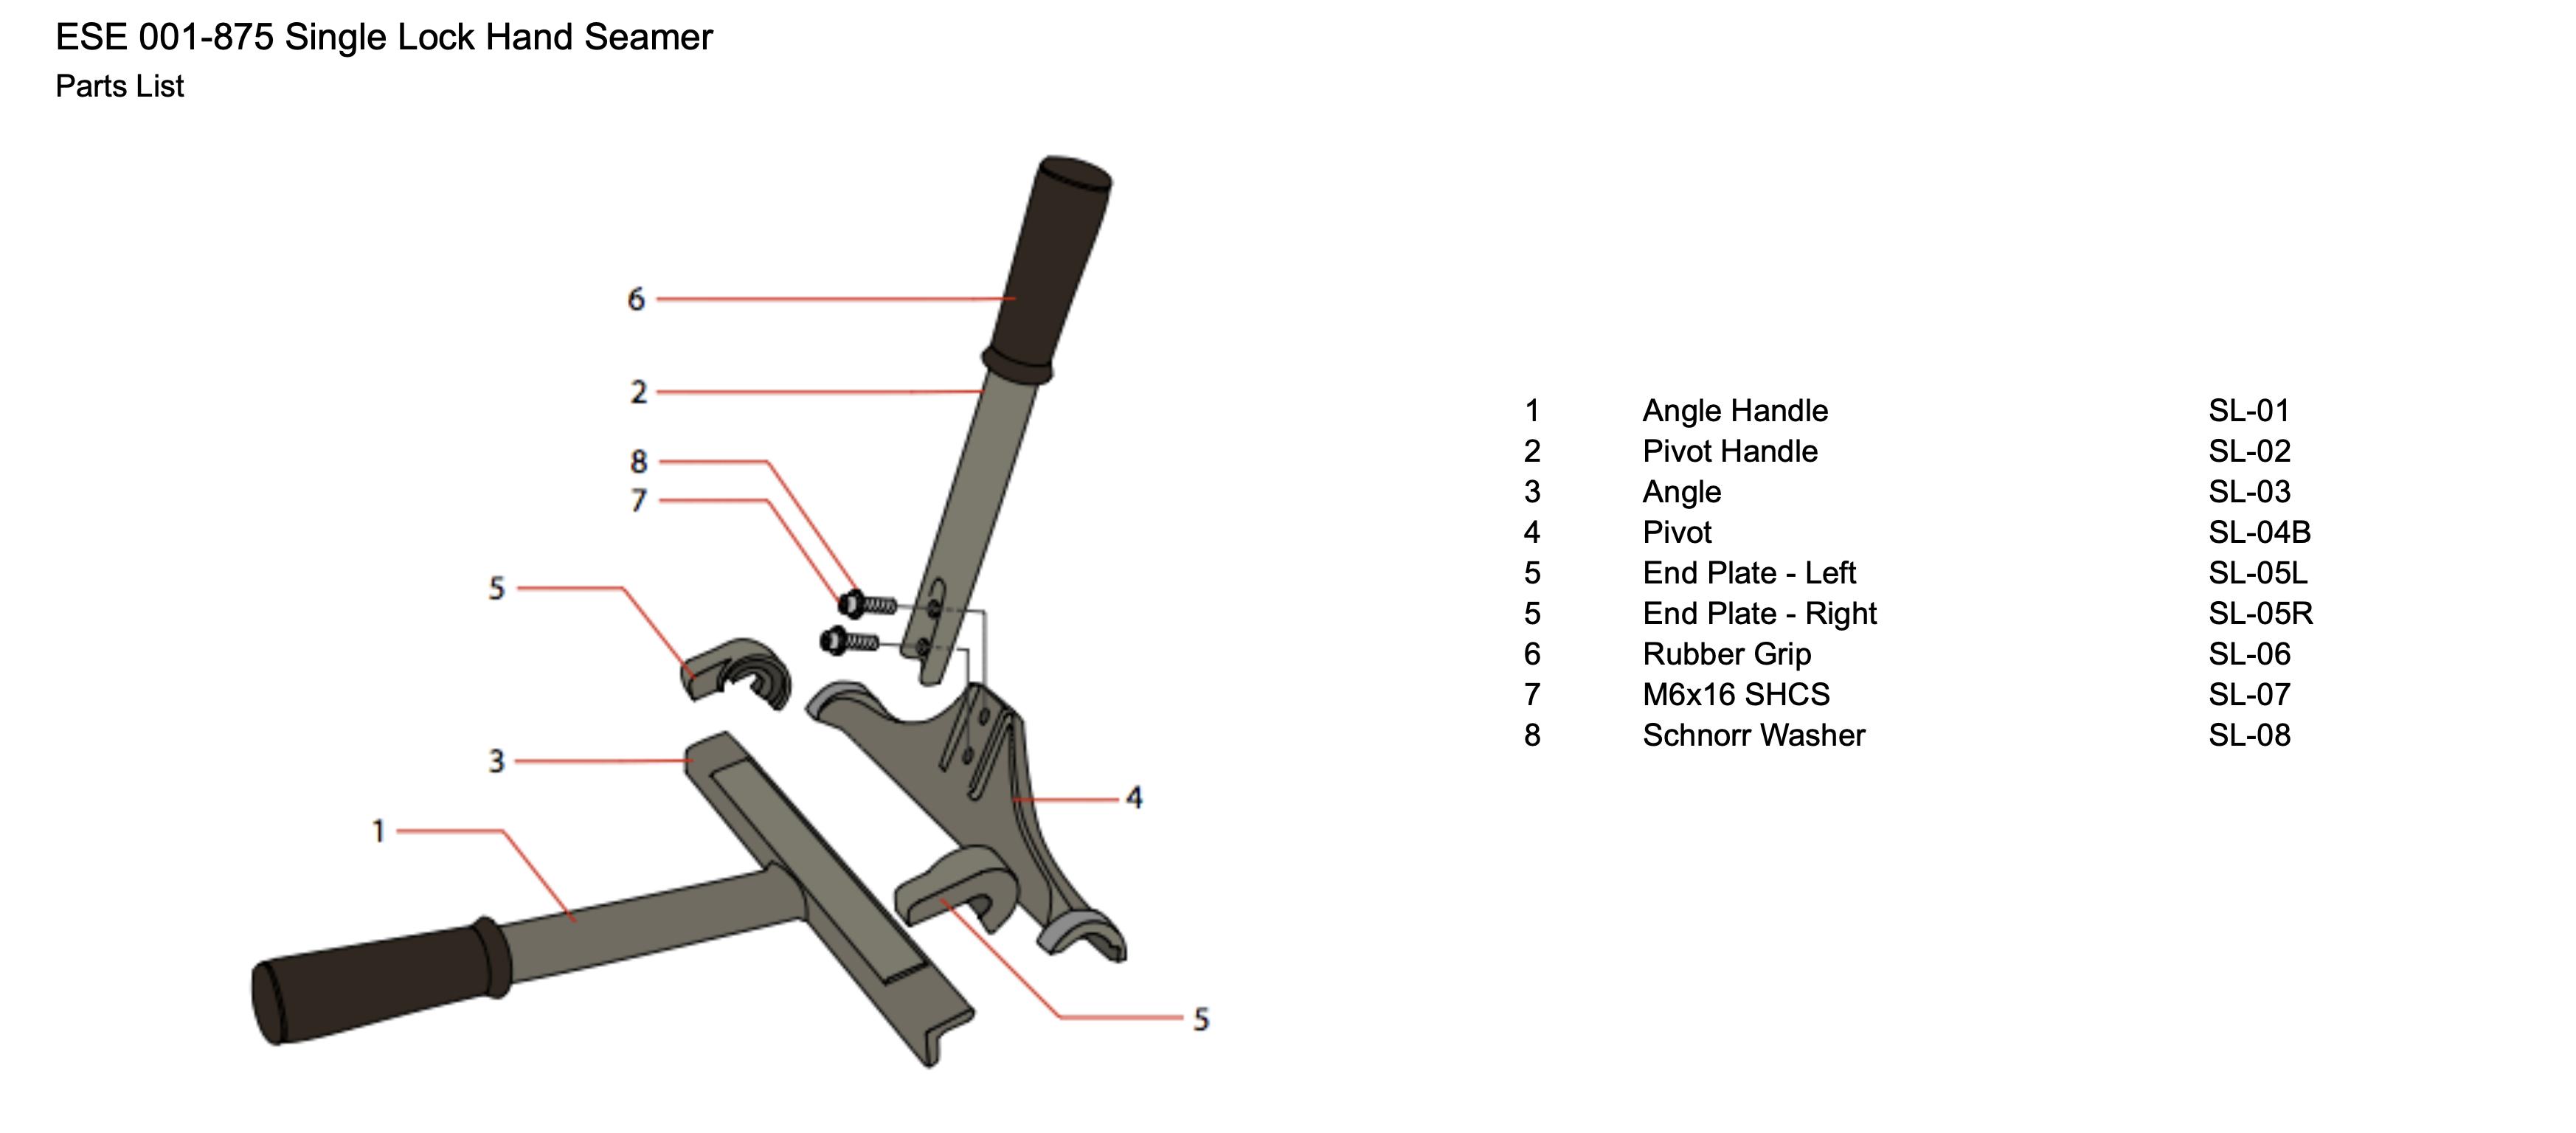 ese-001-875-single-lock-hand-seamer